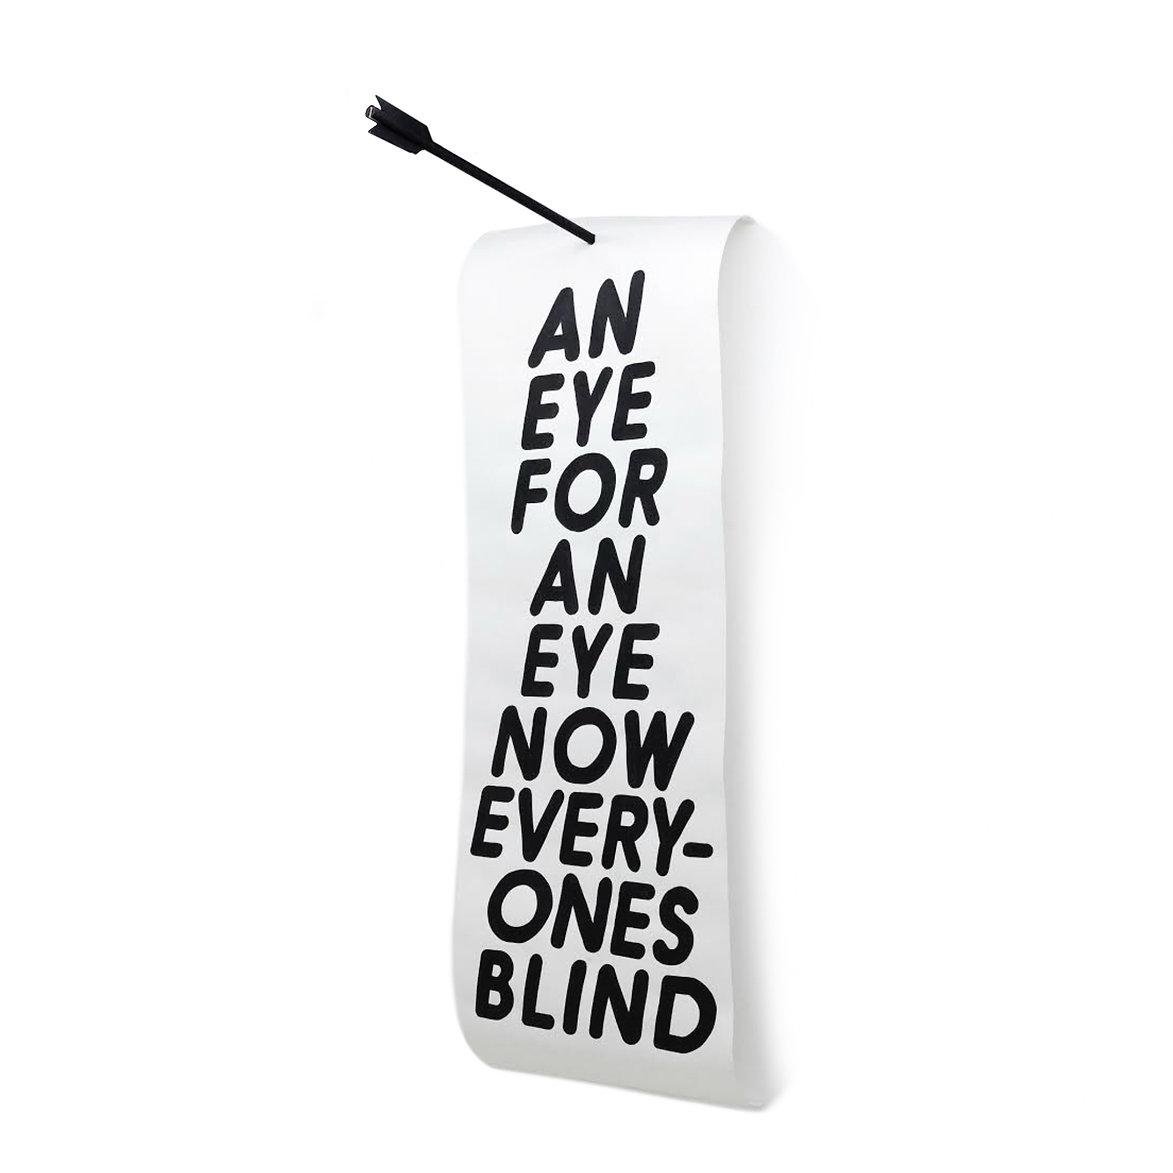 9_Martin_An-Eye-For-An-Eye.jpg